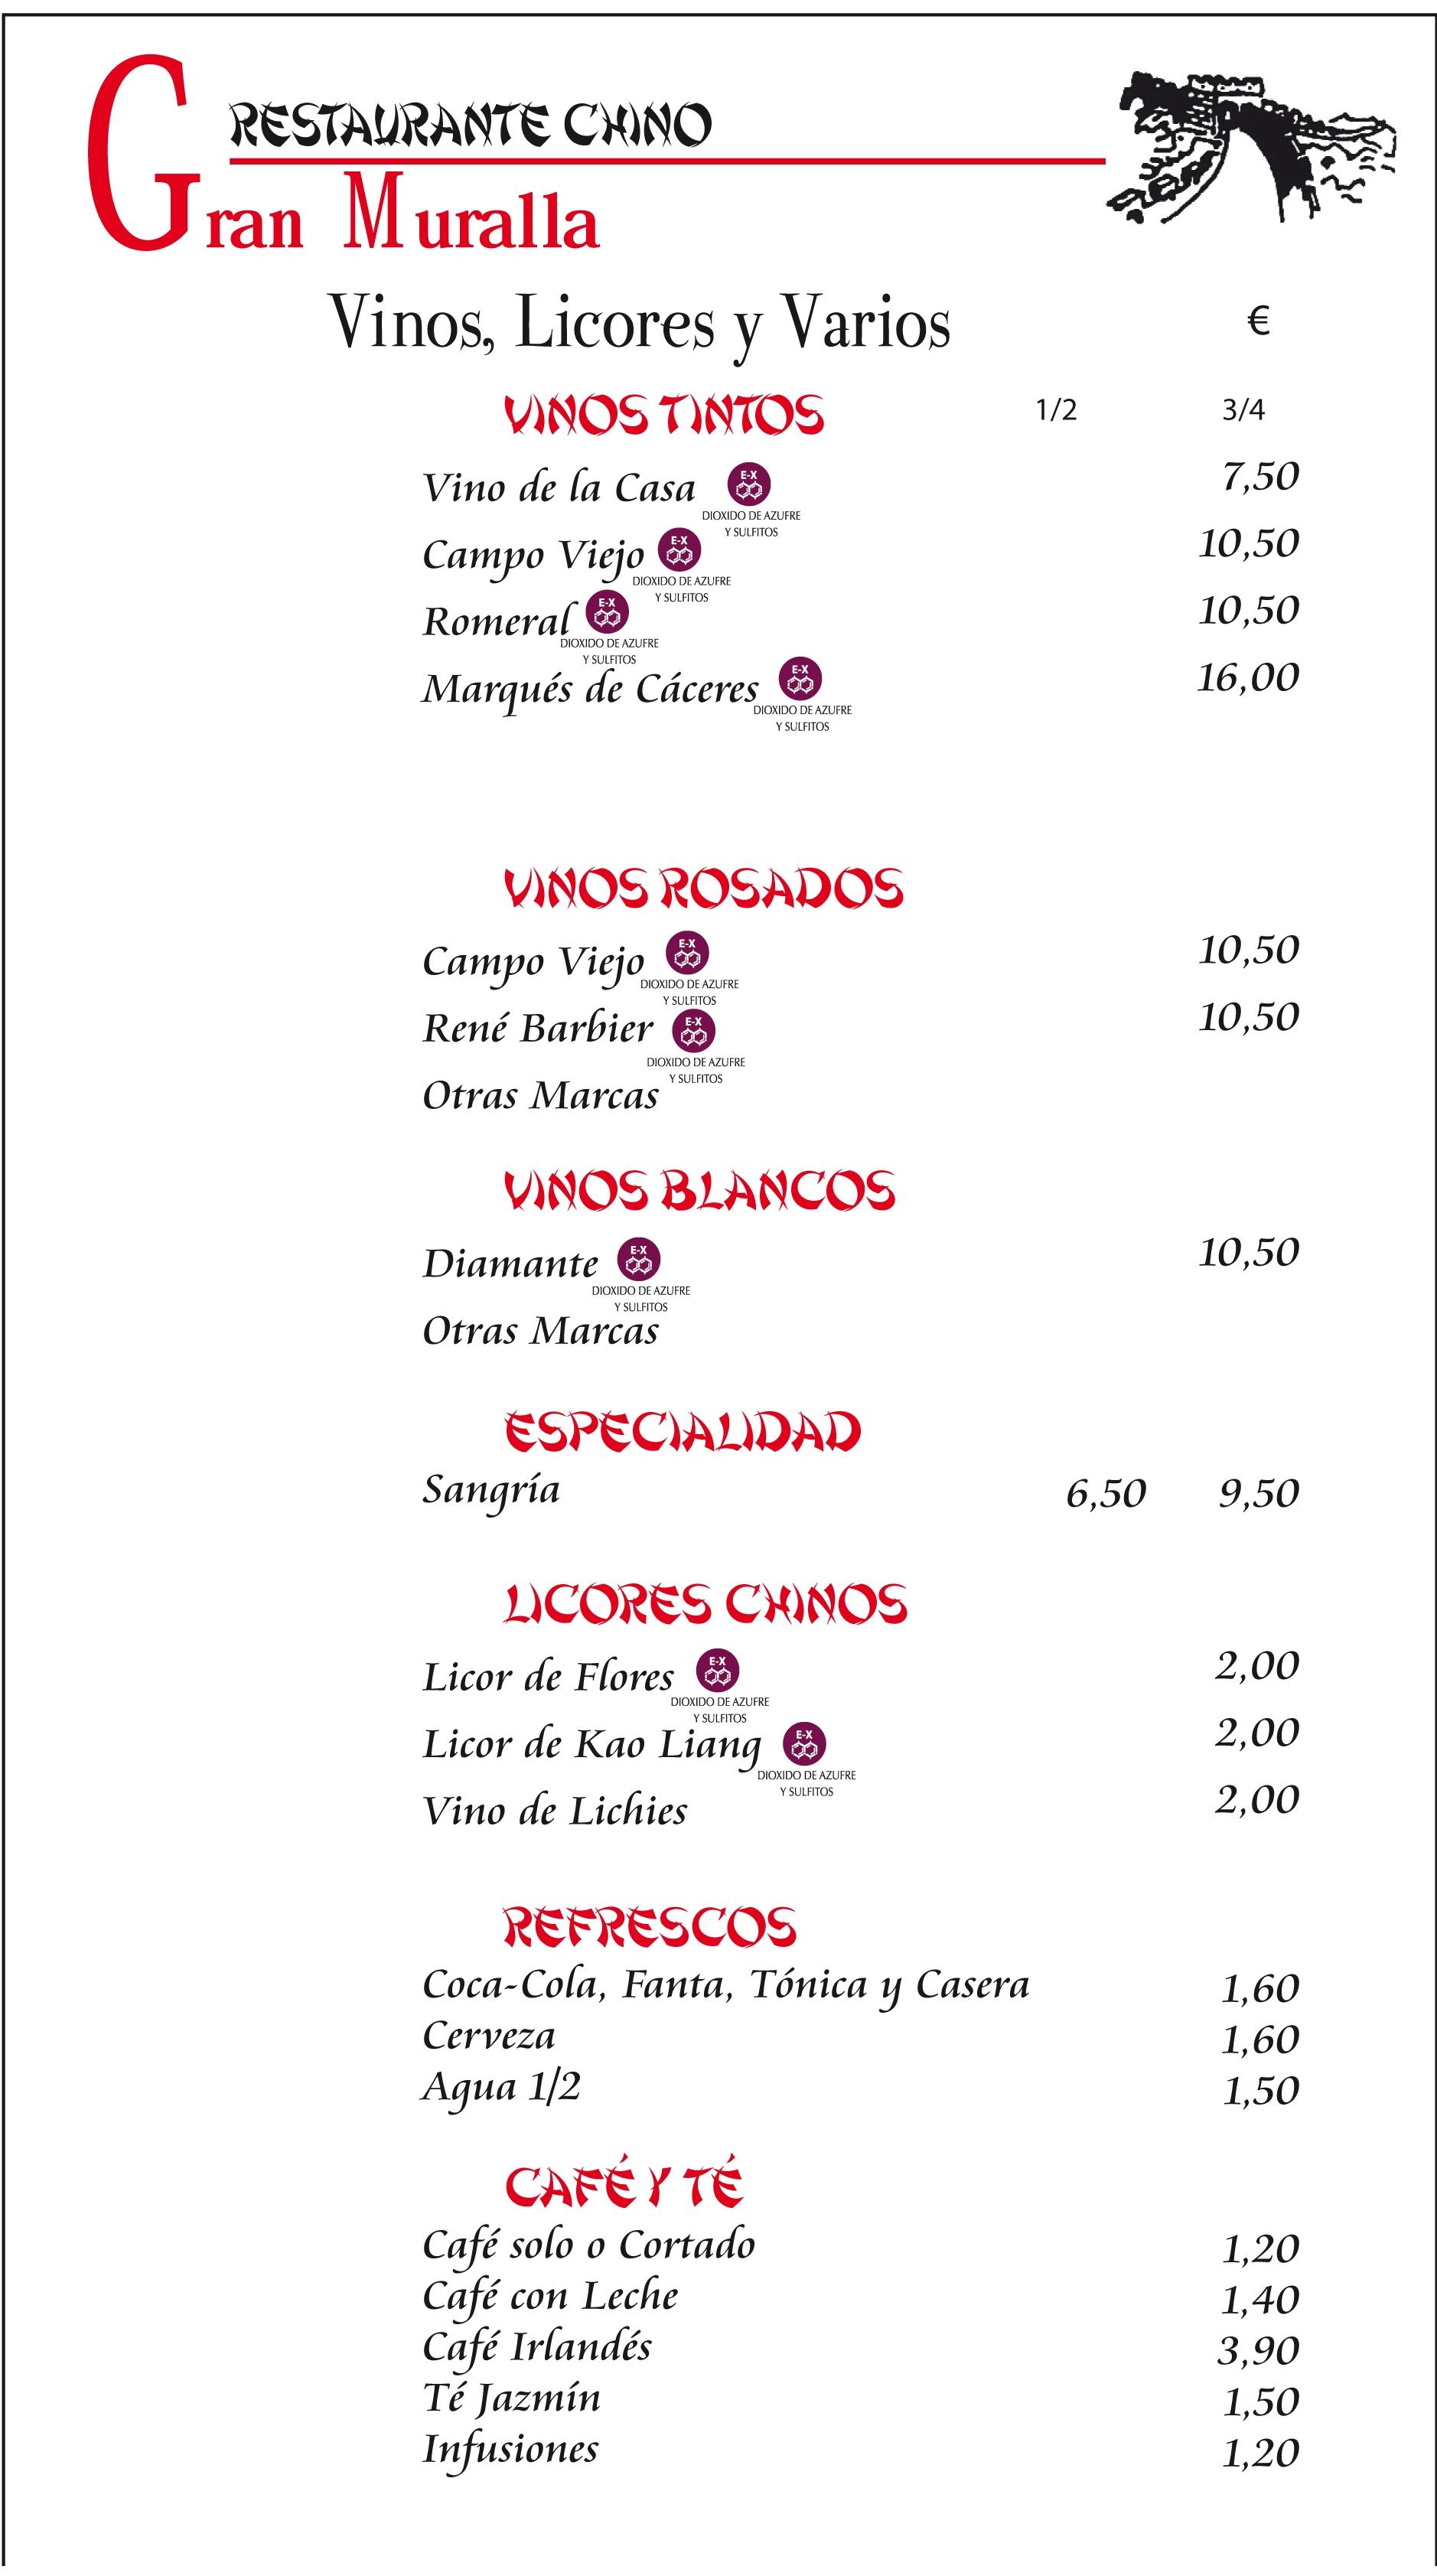 restaurante-chino-carta-16-10F0769AEC-E375-F2C6-850C-C8BAFD21B947.jpg